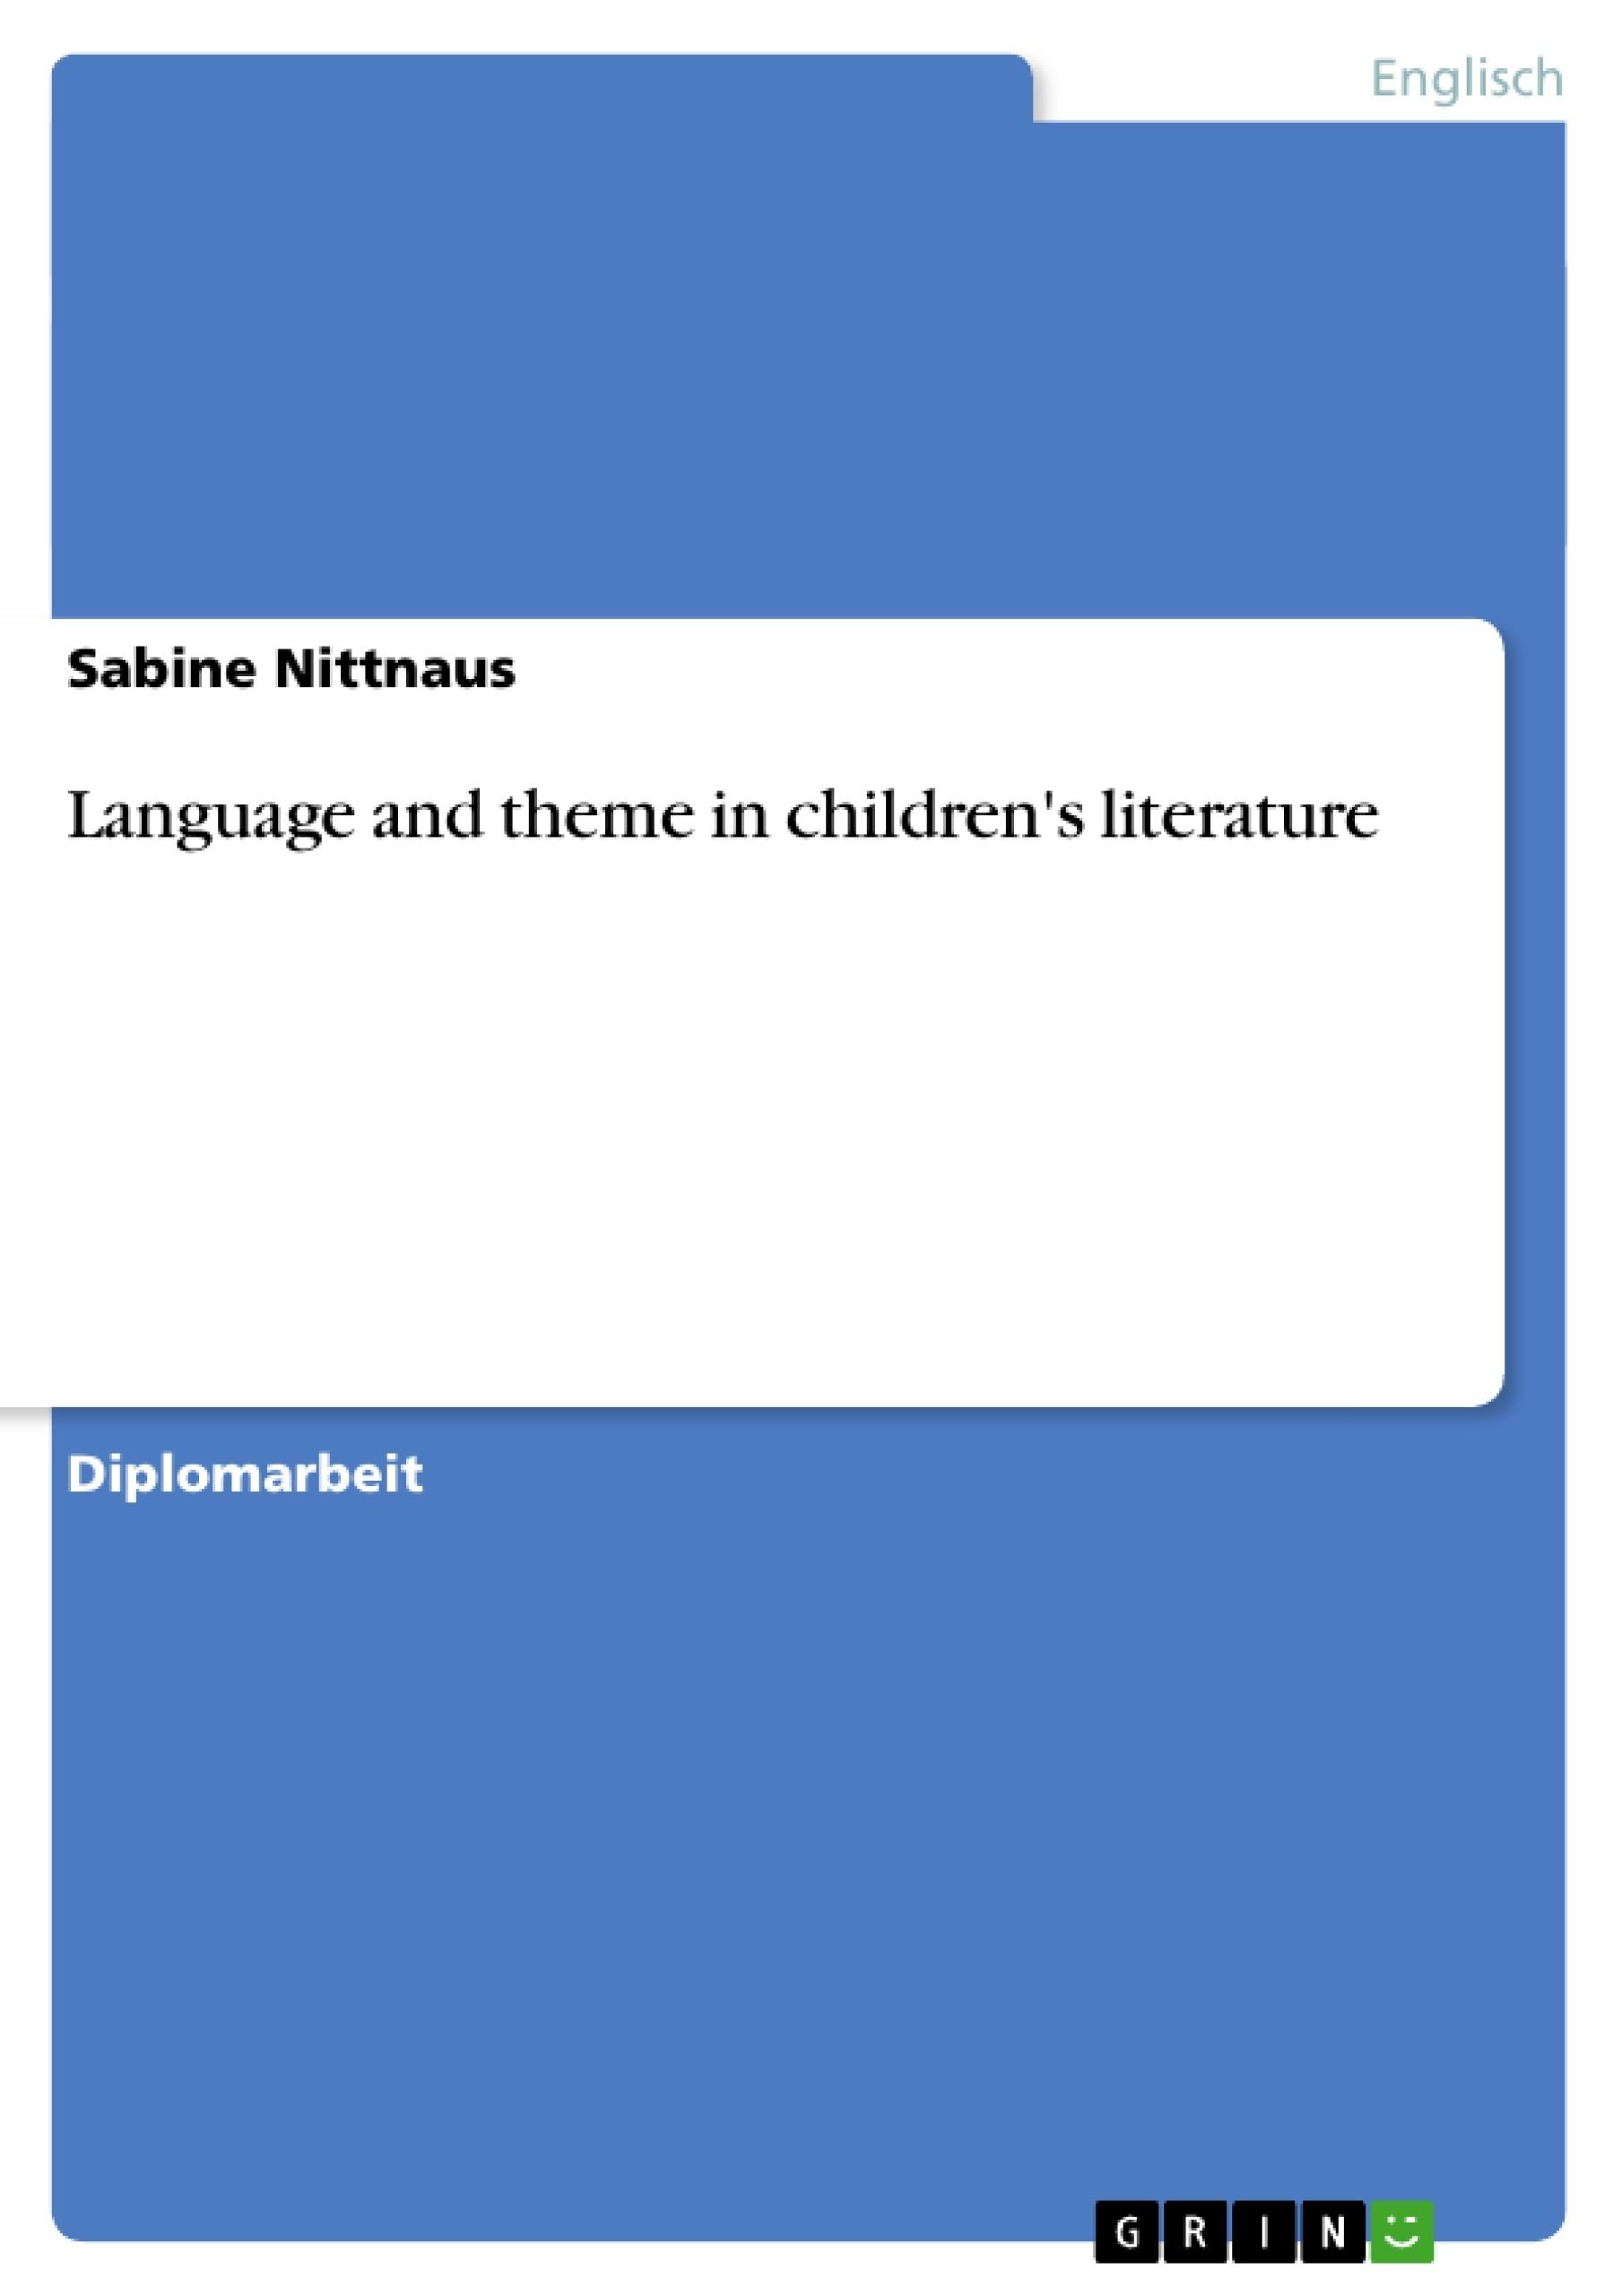 Titel: Language and theme in children's literature